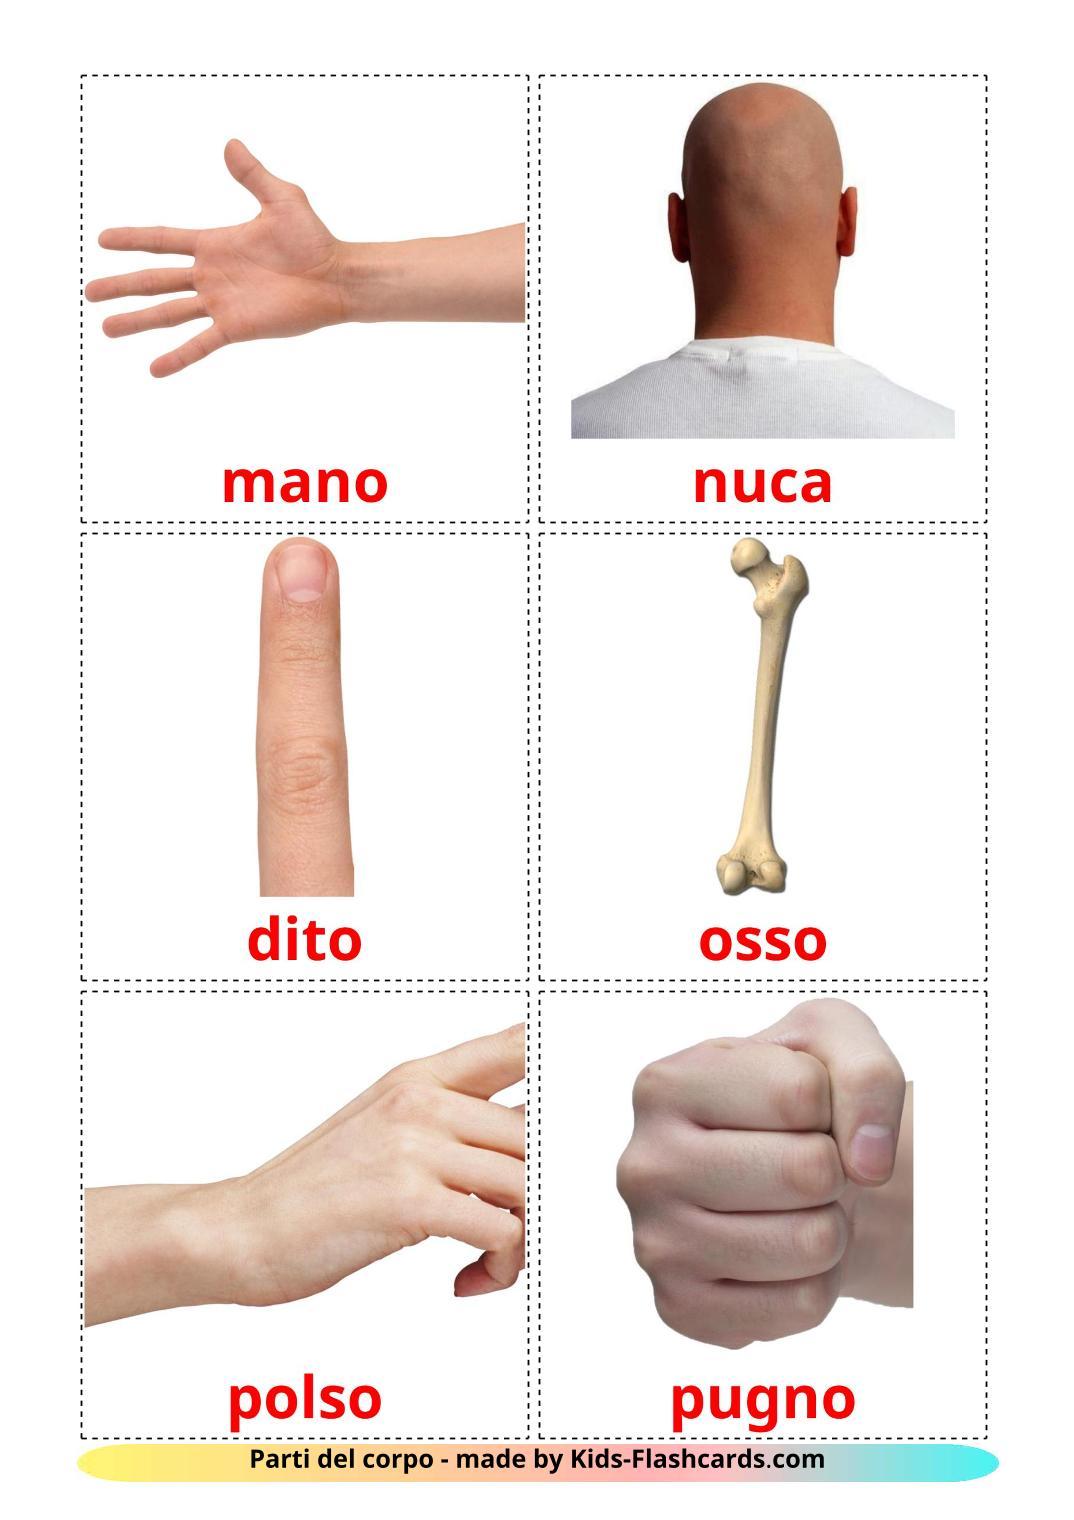 Body Parts - 26 Free Printable italian Flashcards